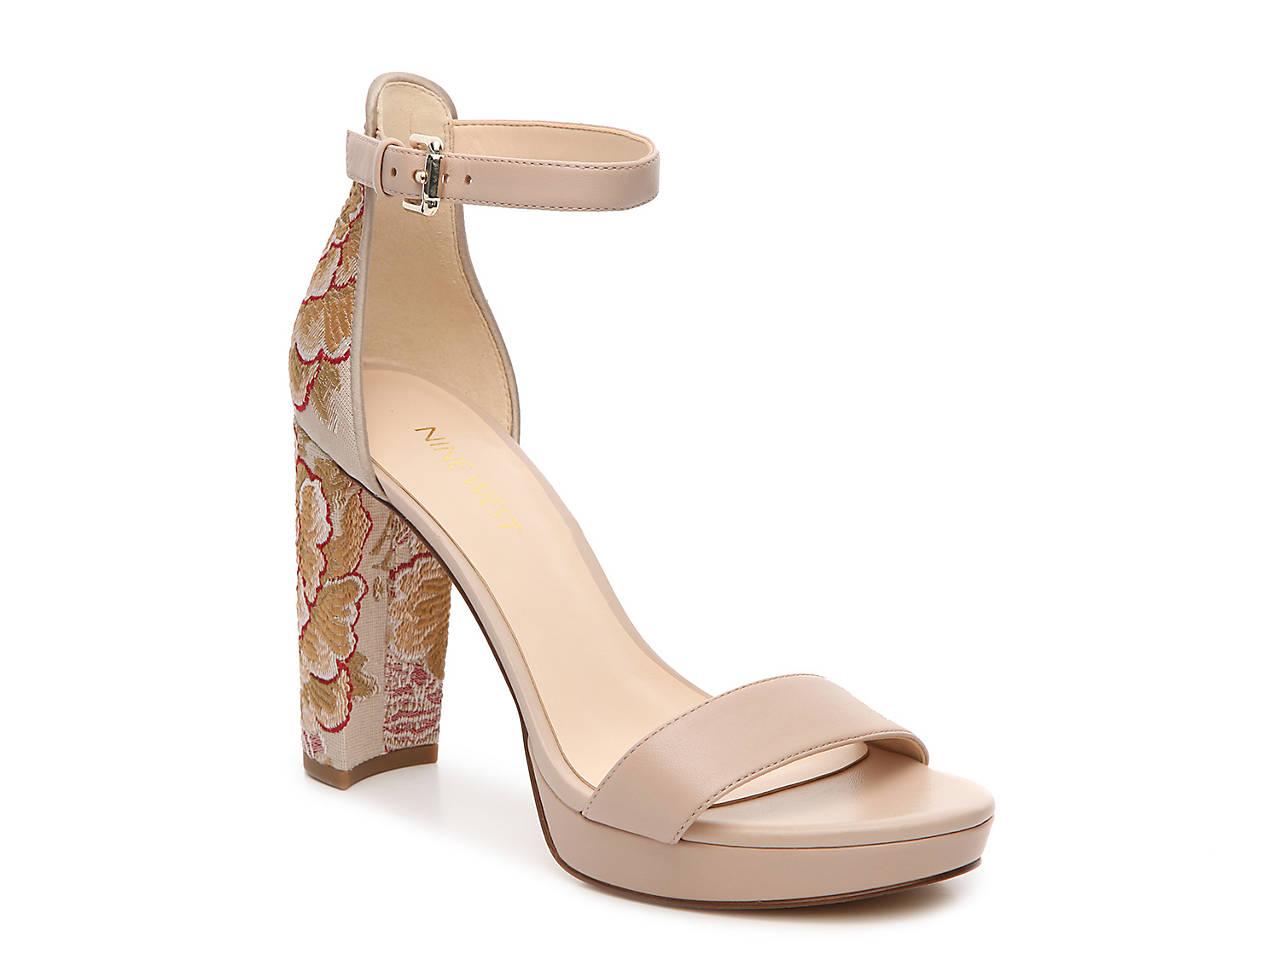 6e4b6782ddc Nine West Doyurthing Sandal Women s Shoes